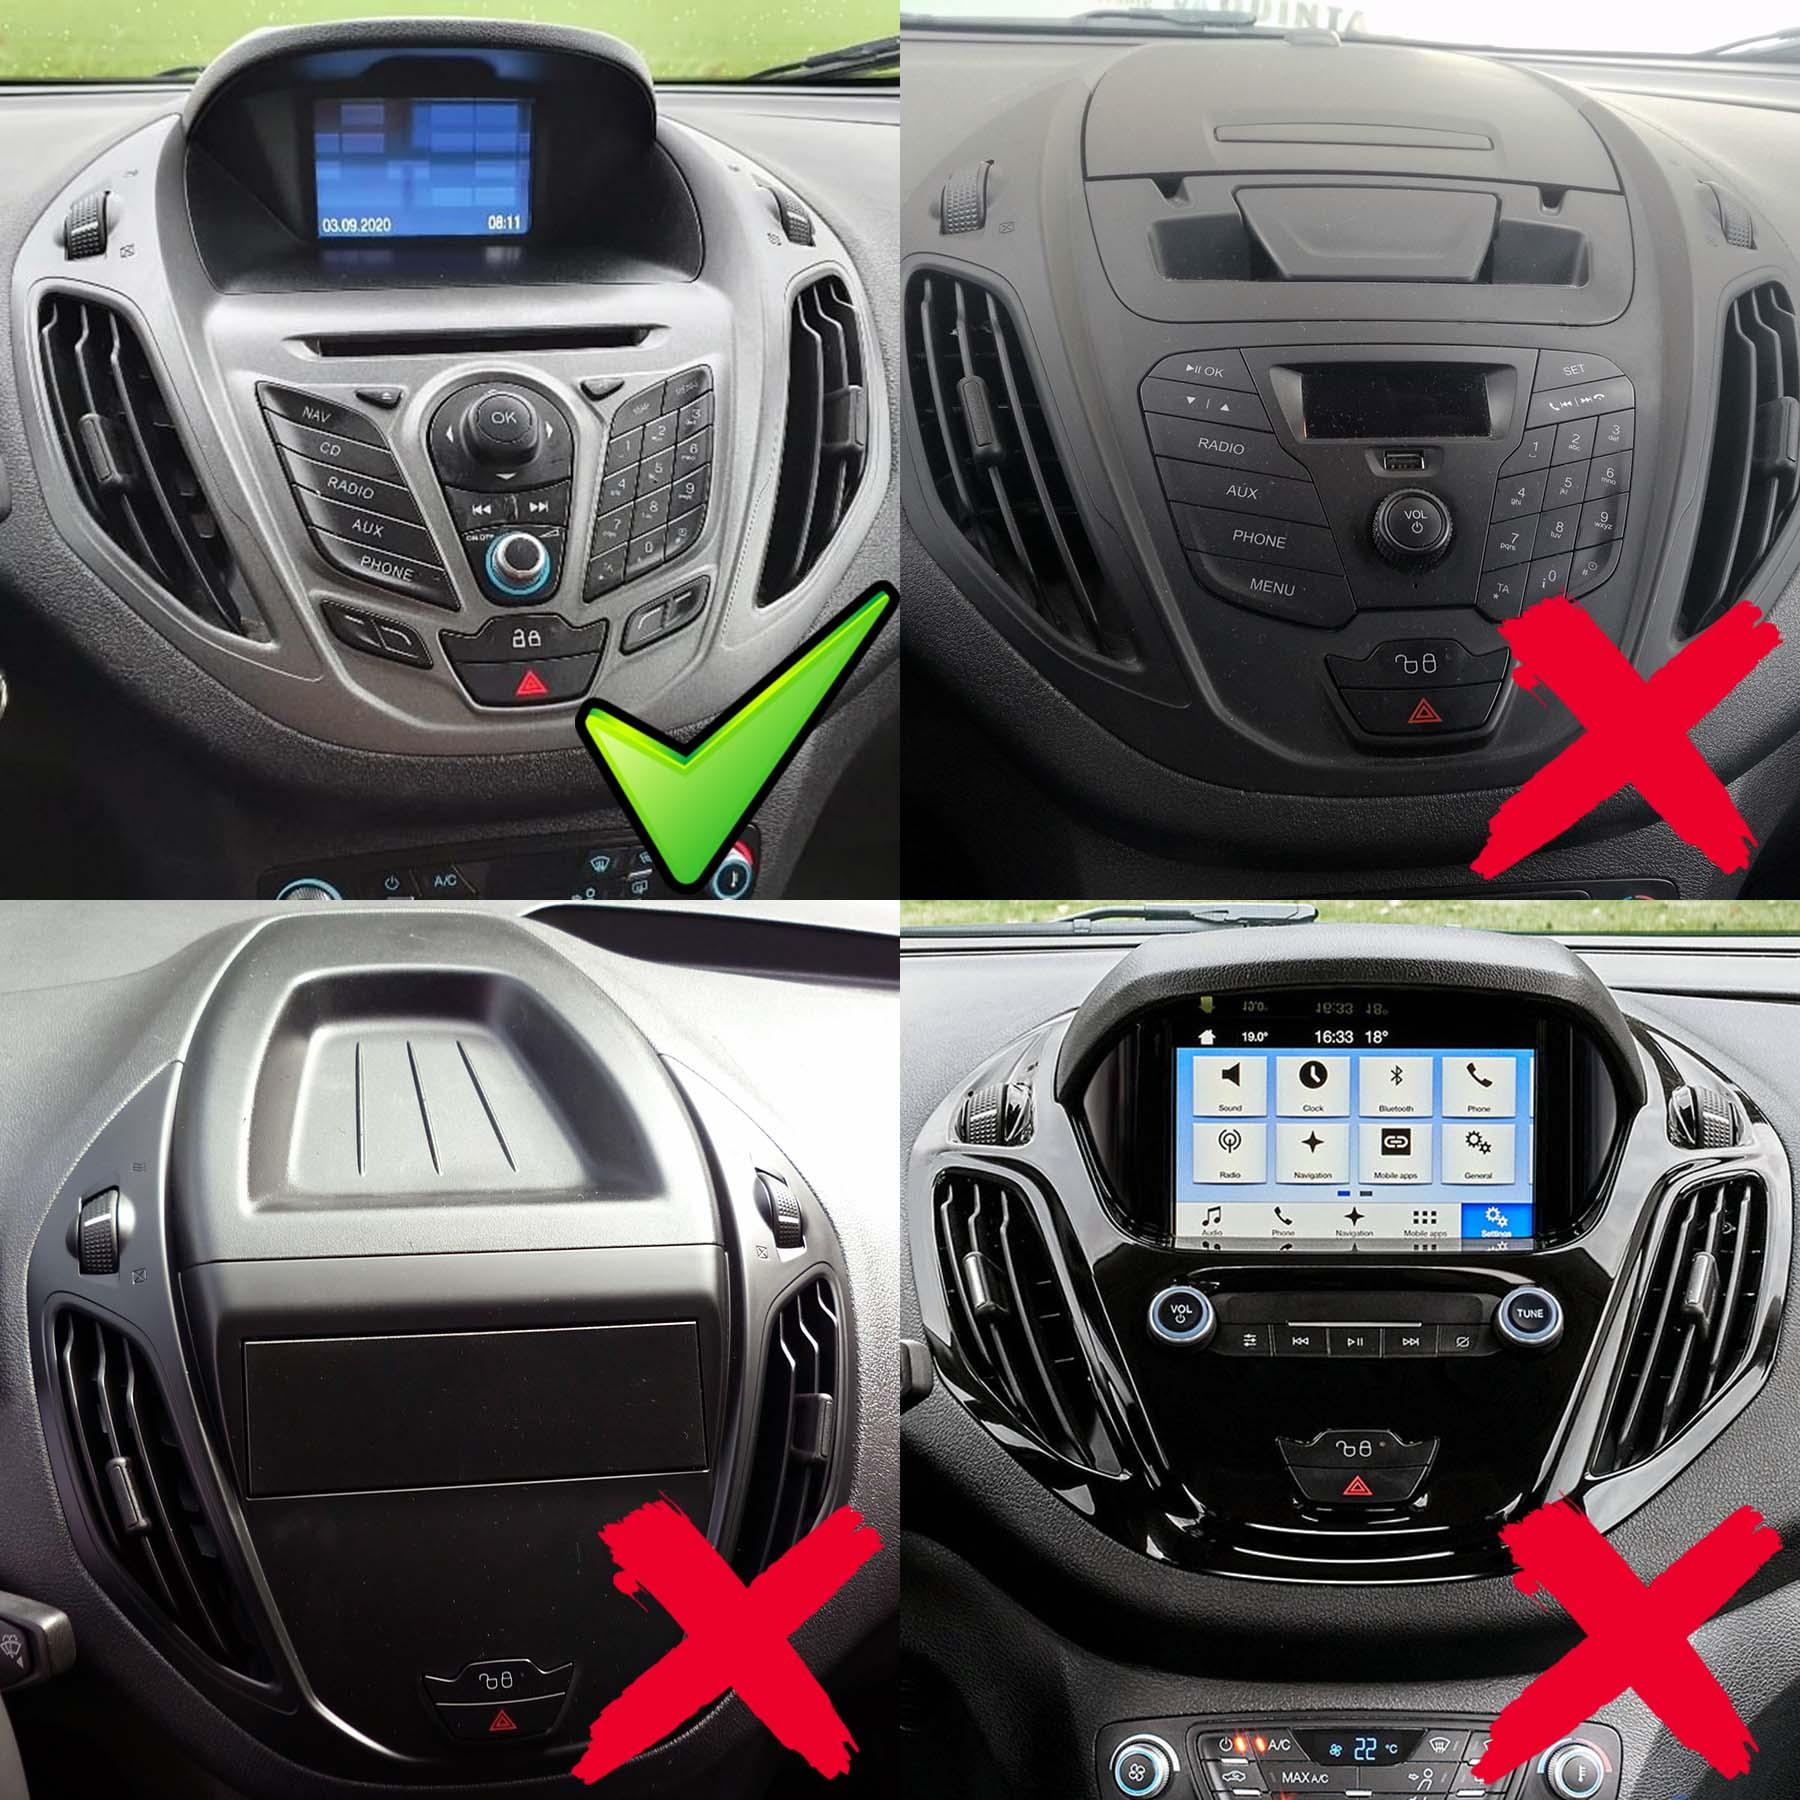 Ford Tourneo/Transit courier 2014-2017 radio upgrade